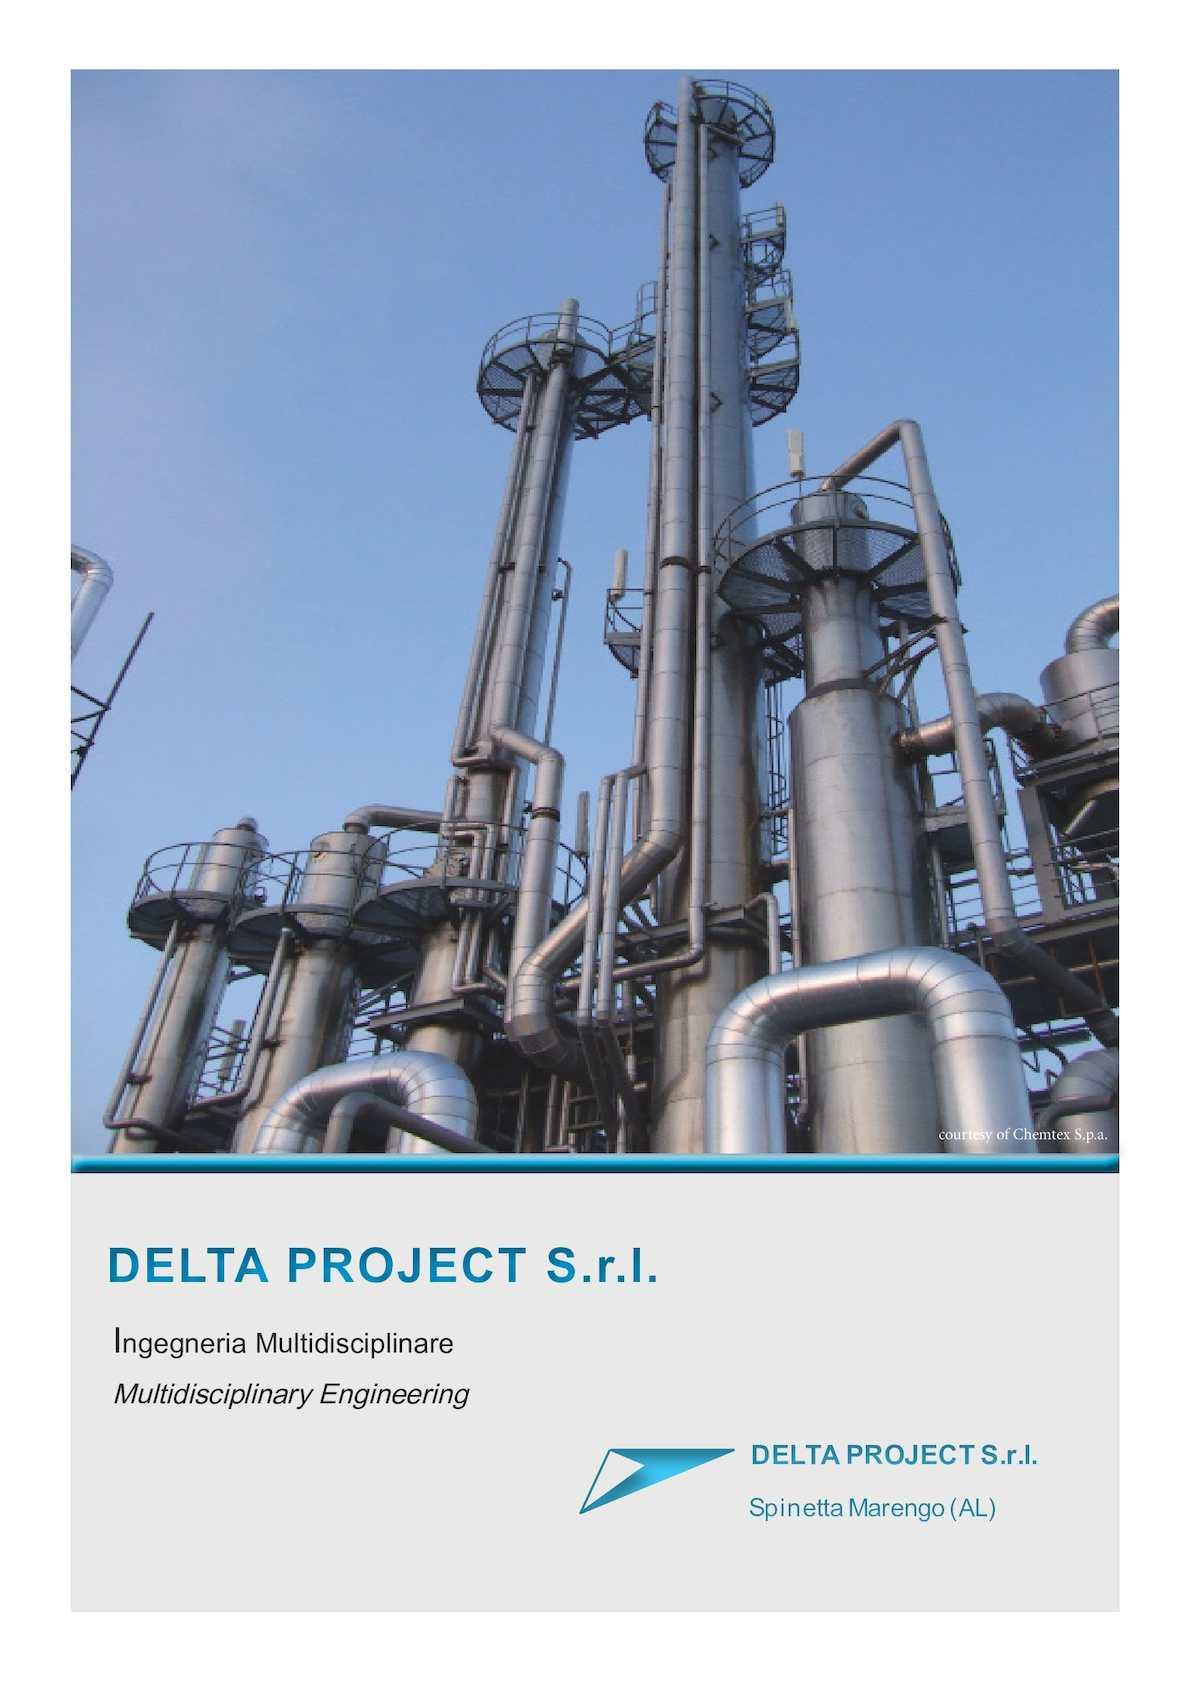 Delta forex s.r.l